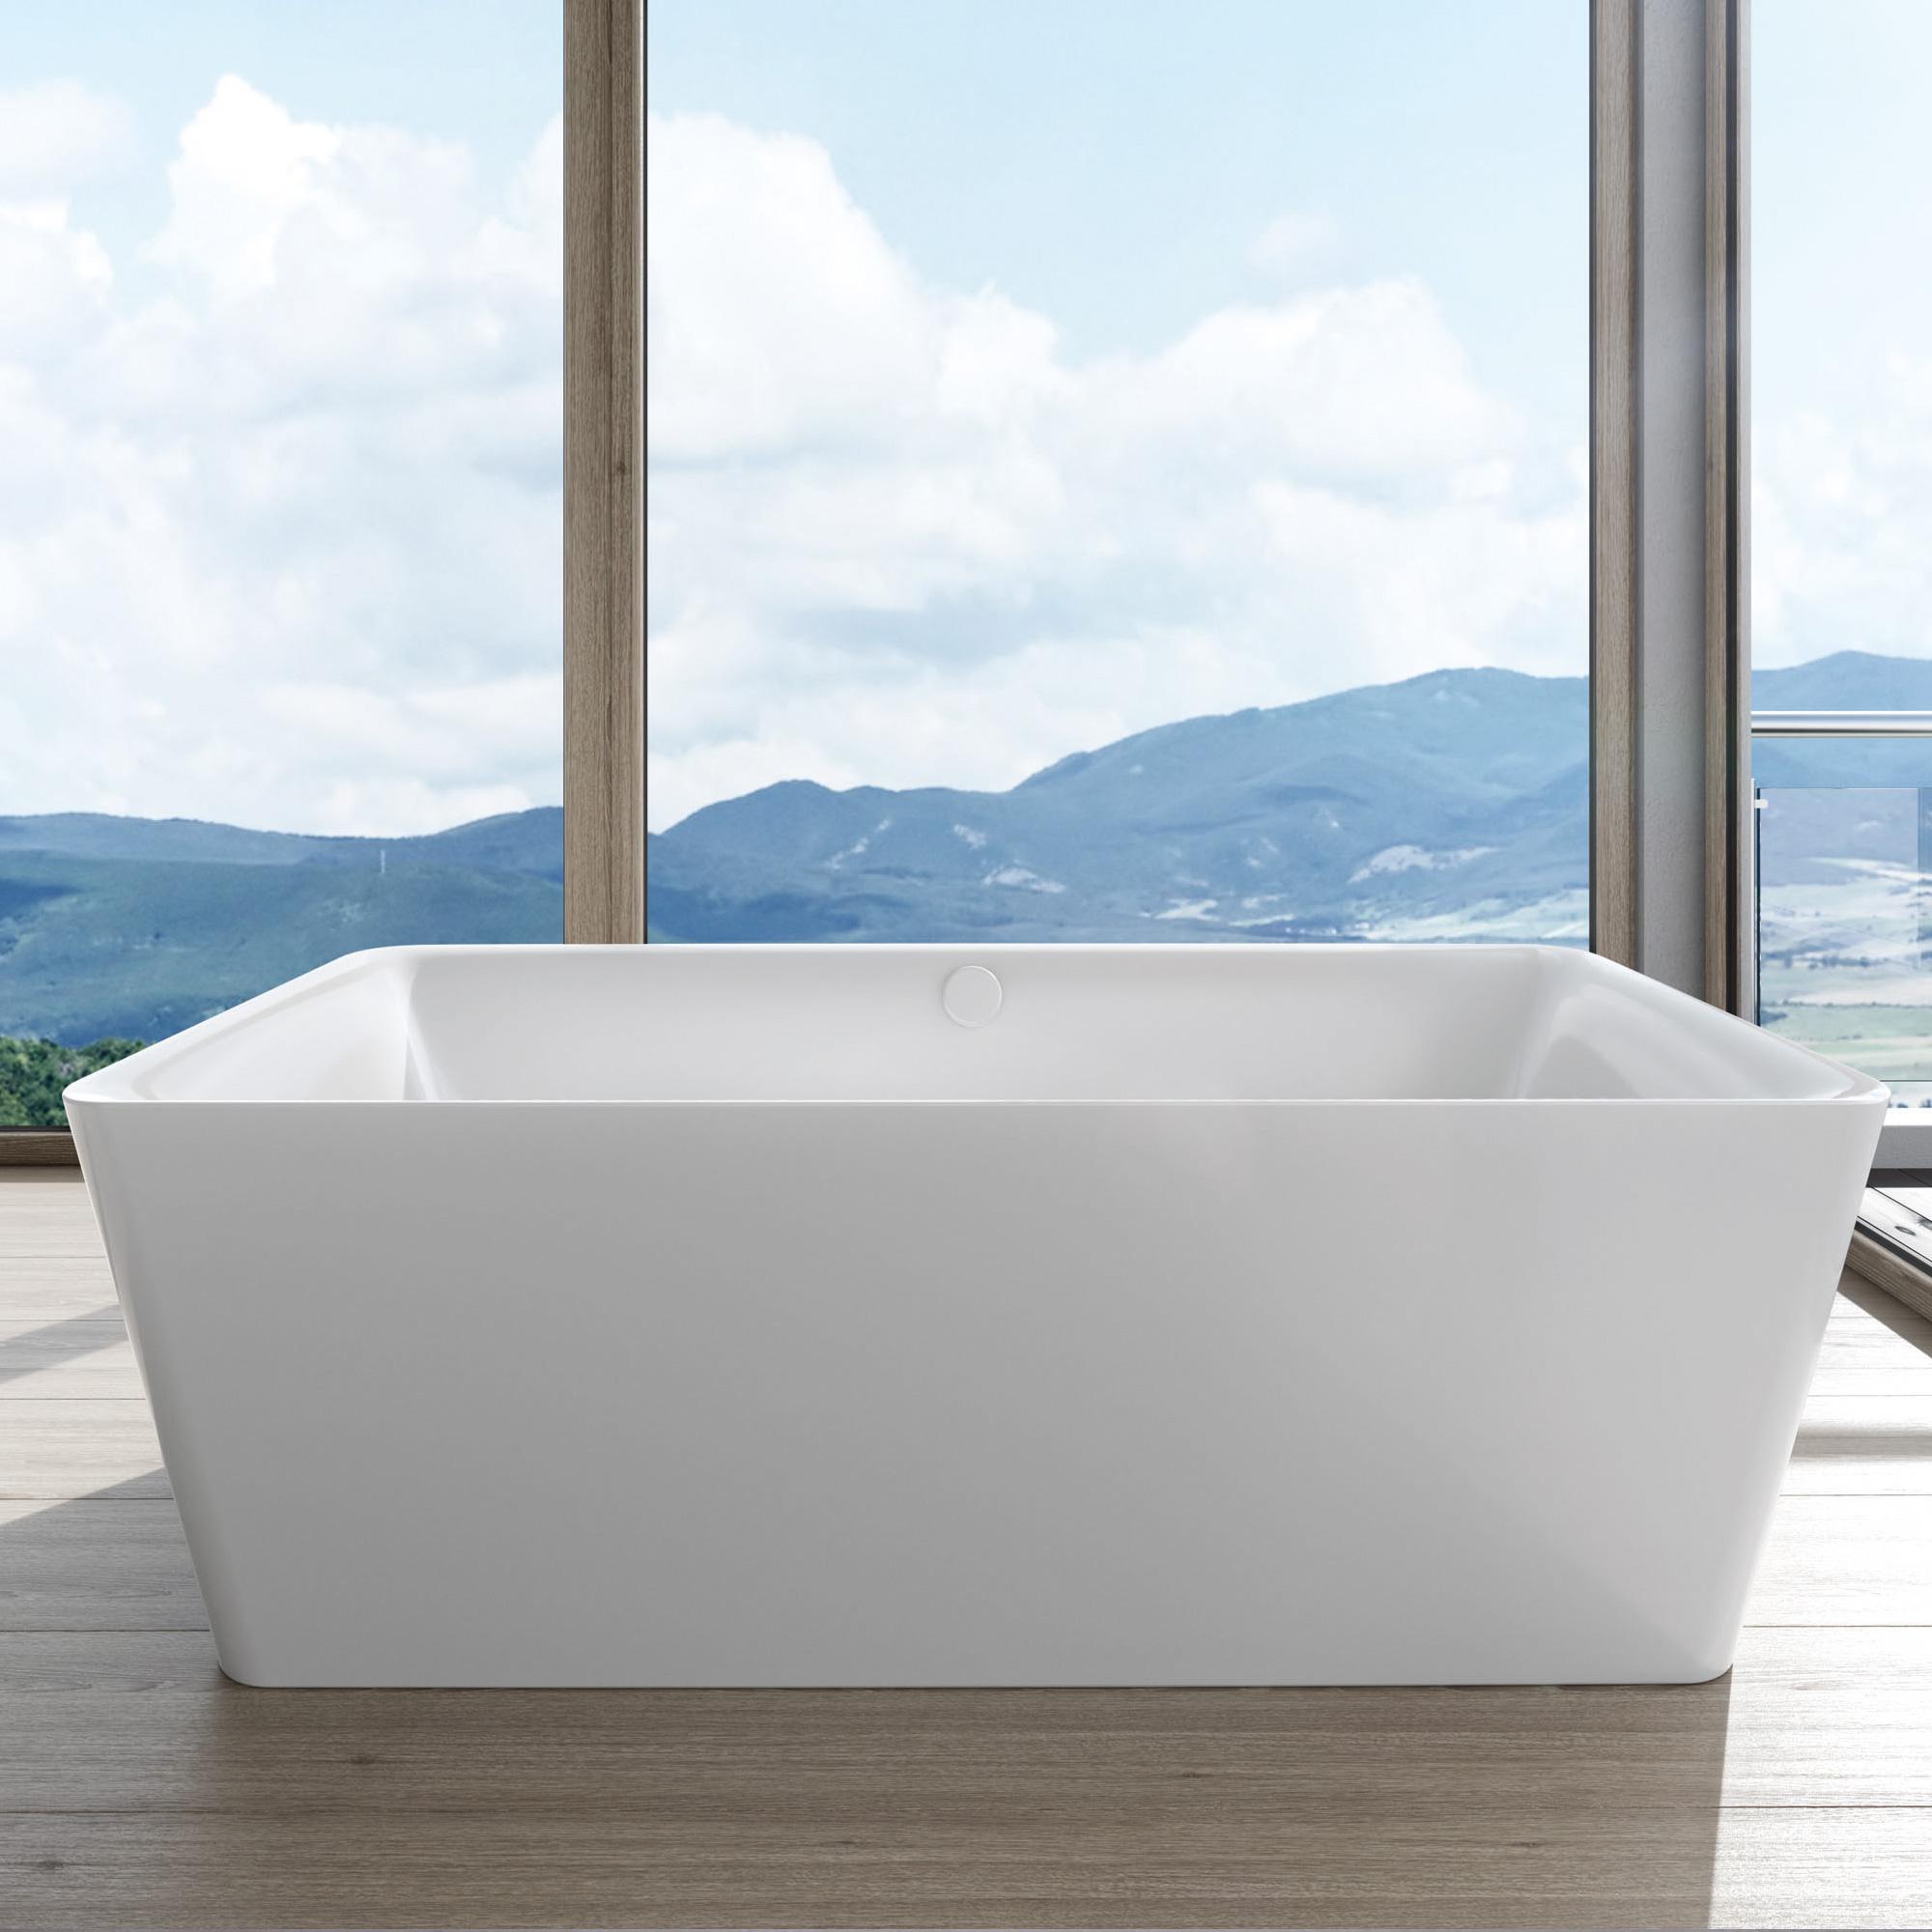 kaldewei meisterst ck incava freistehende badewanne l 175 b 76 h 45 cm 201340803001. Black Bedroom Furniture Sets. Home Design Ideas